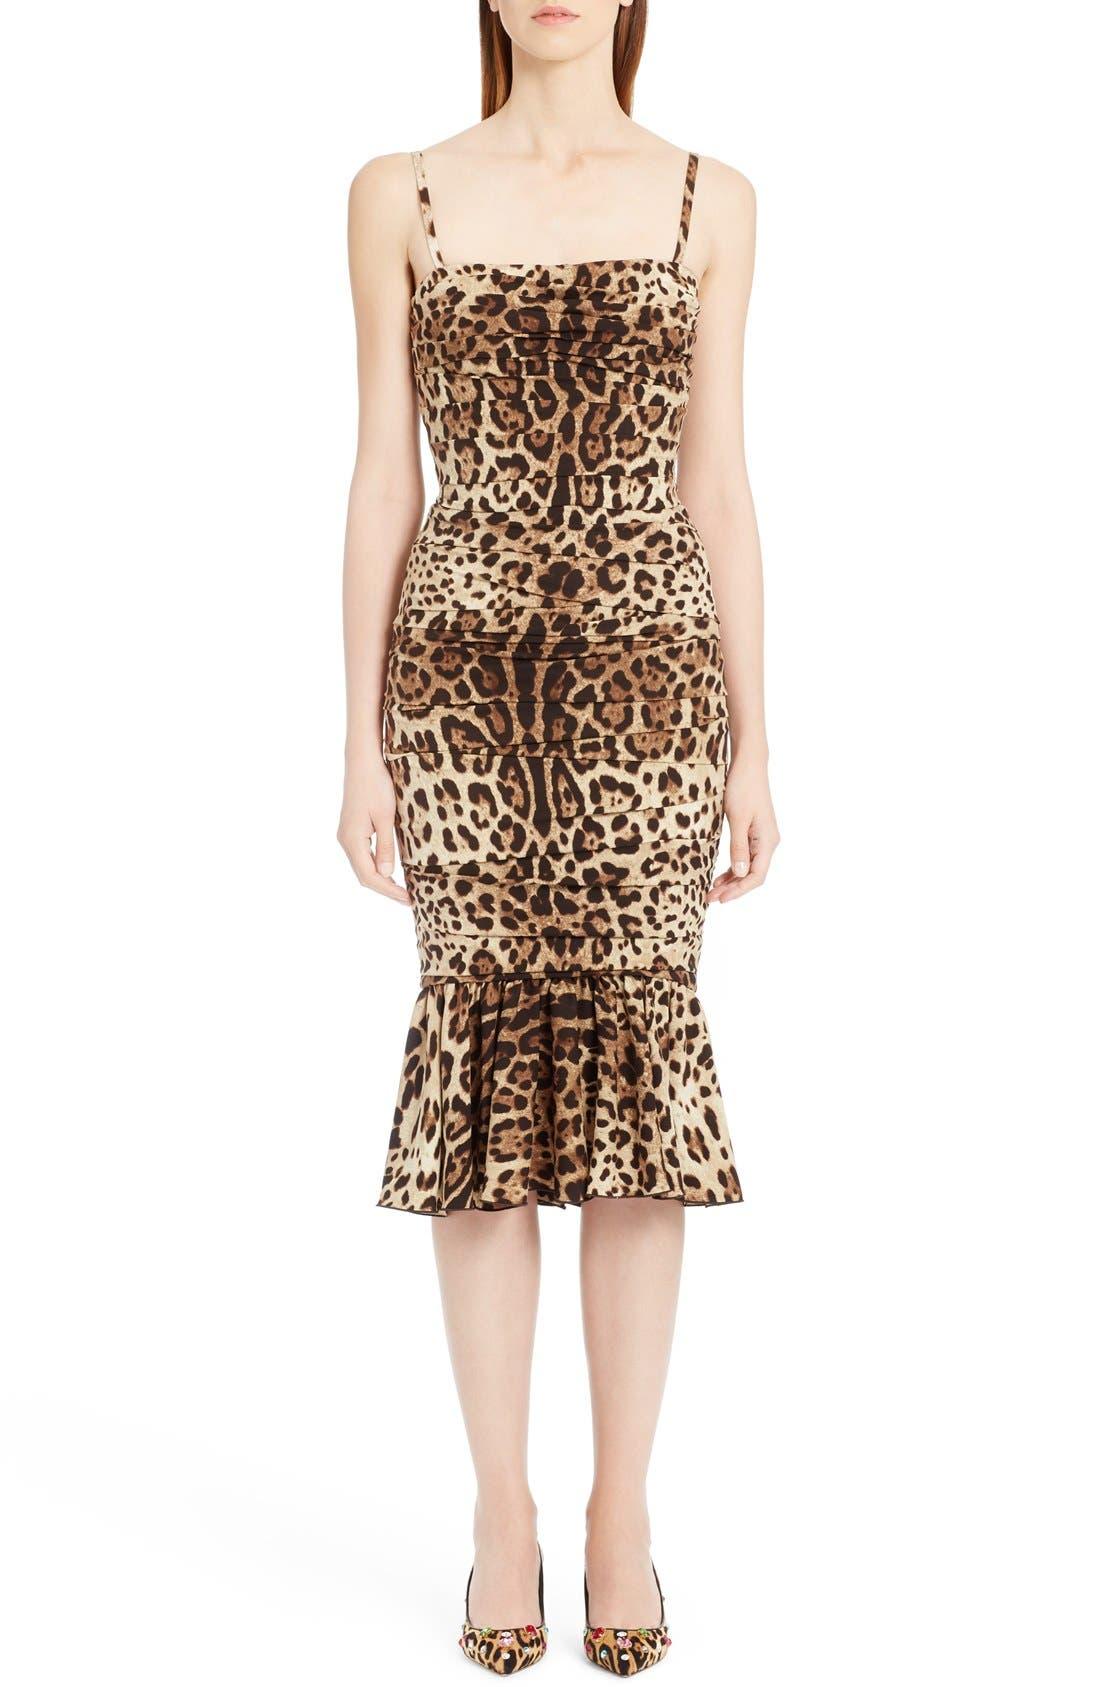 DOLCE&GABBANA Stretch Cady Leopard Print Ruched Dress